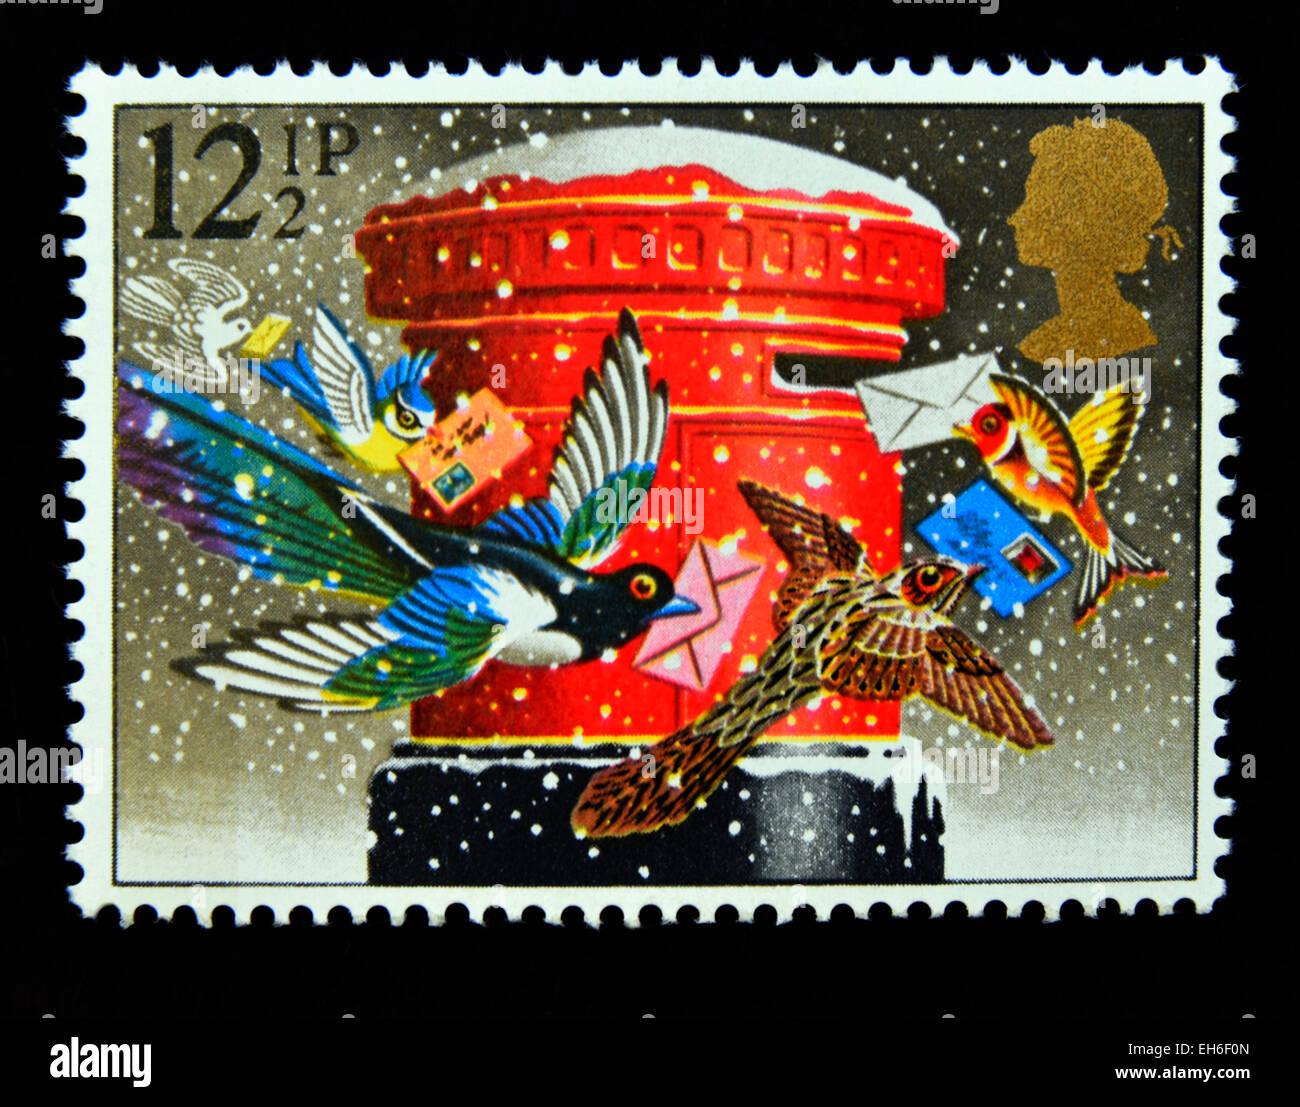 Christmas Pillar Box Stockfotos & Christmas Pillar Box Bilder - Alamy